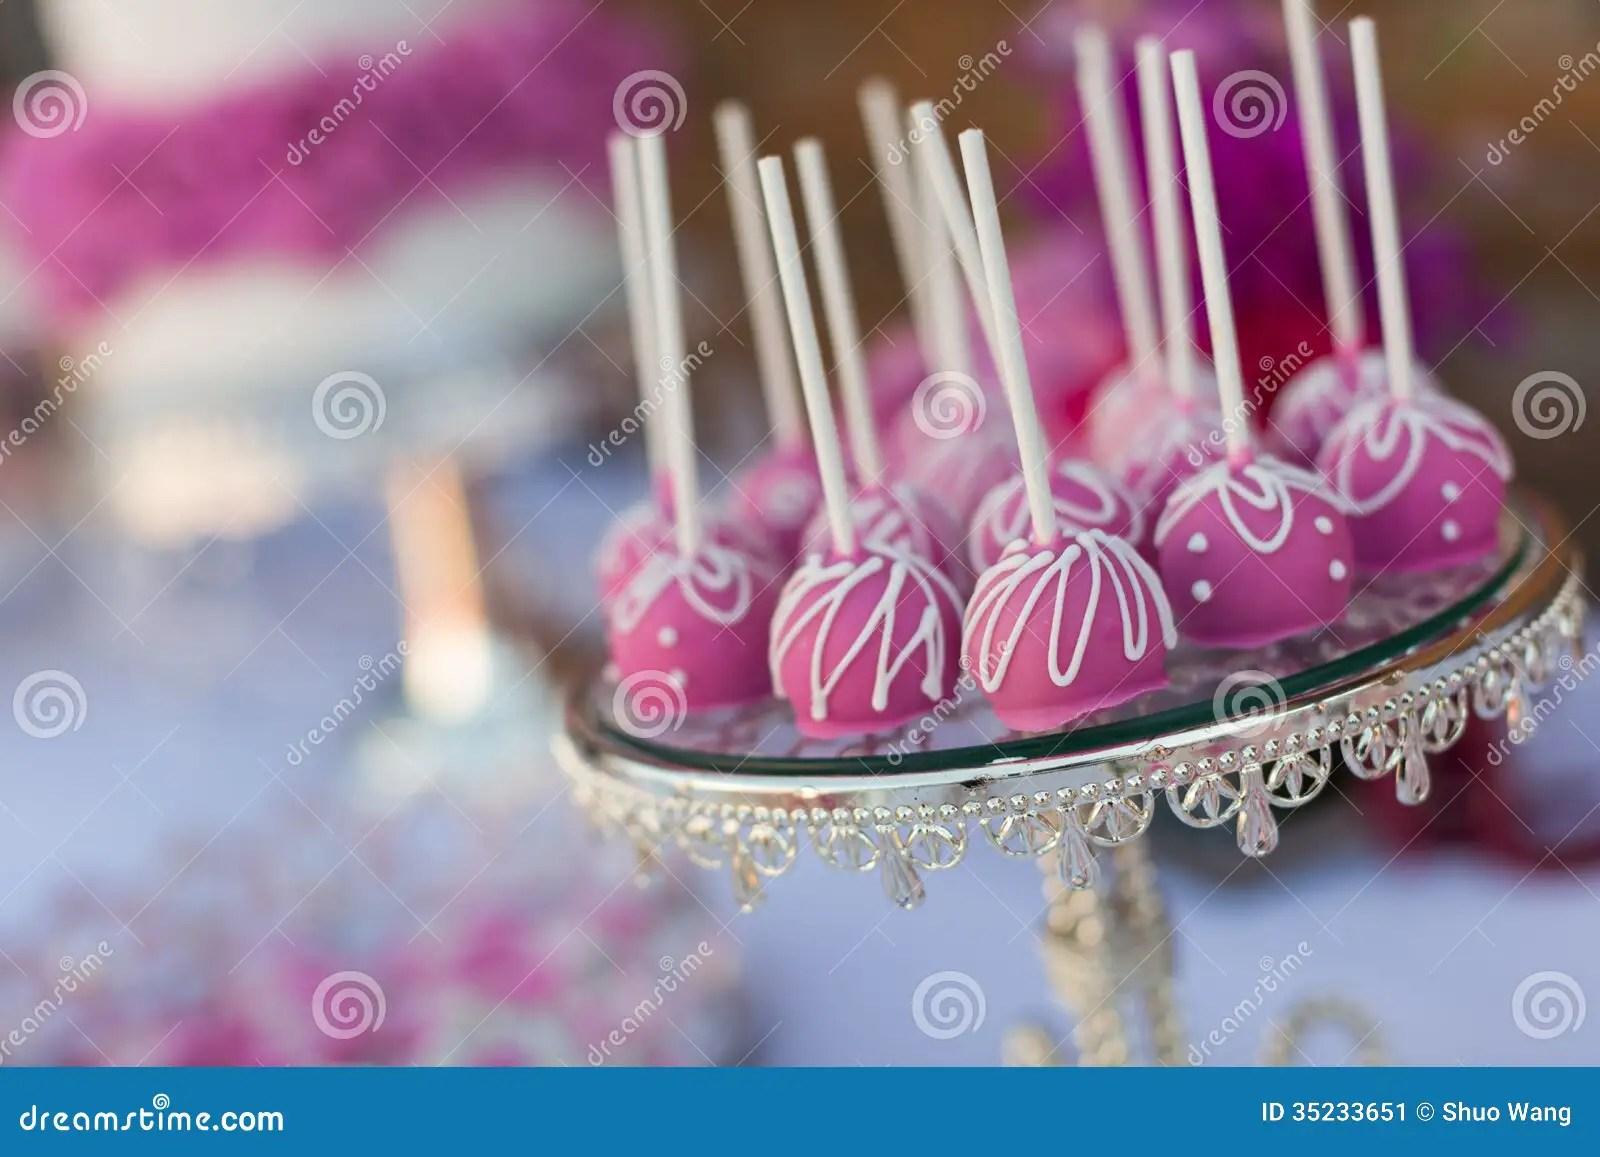 stock image cake pops cupcakes wedding image wedding cake pops Cake pops and cupcakes